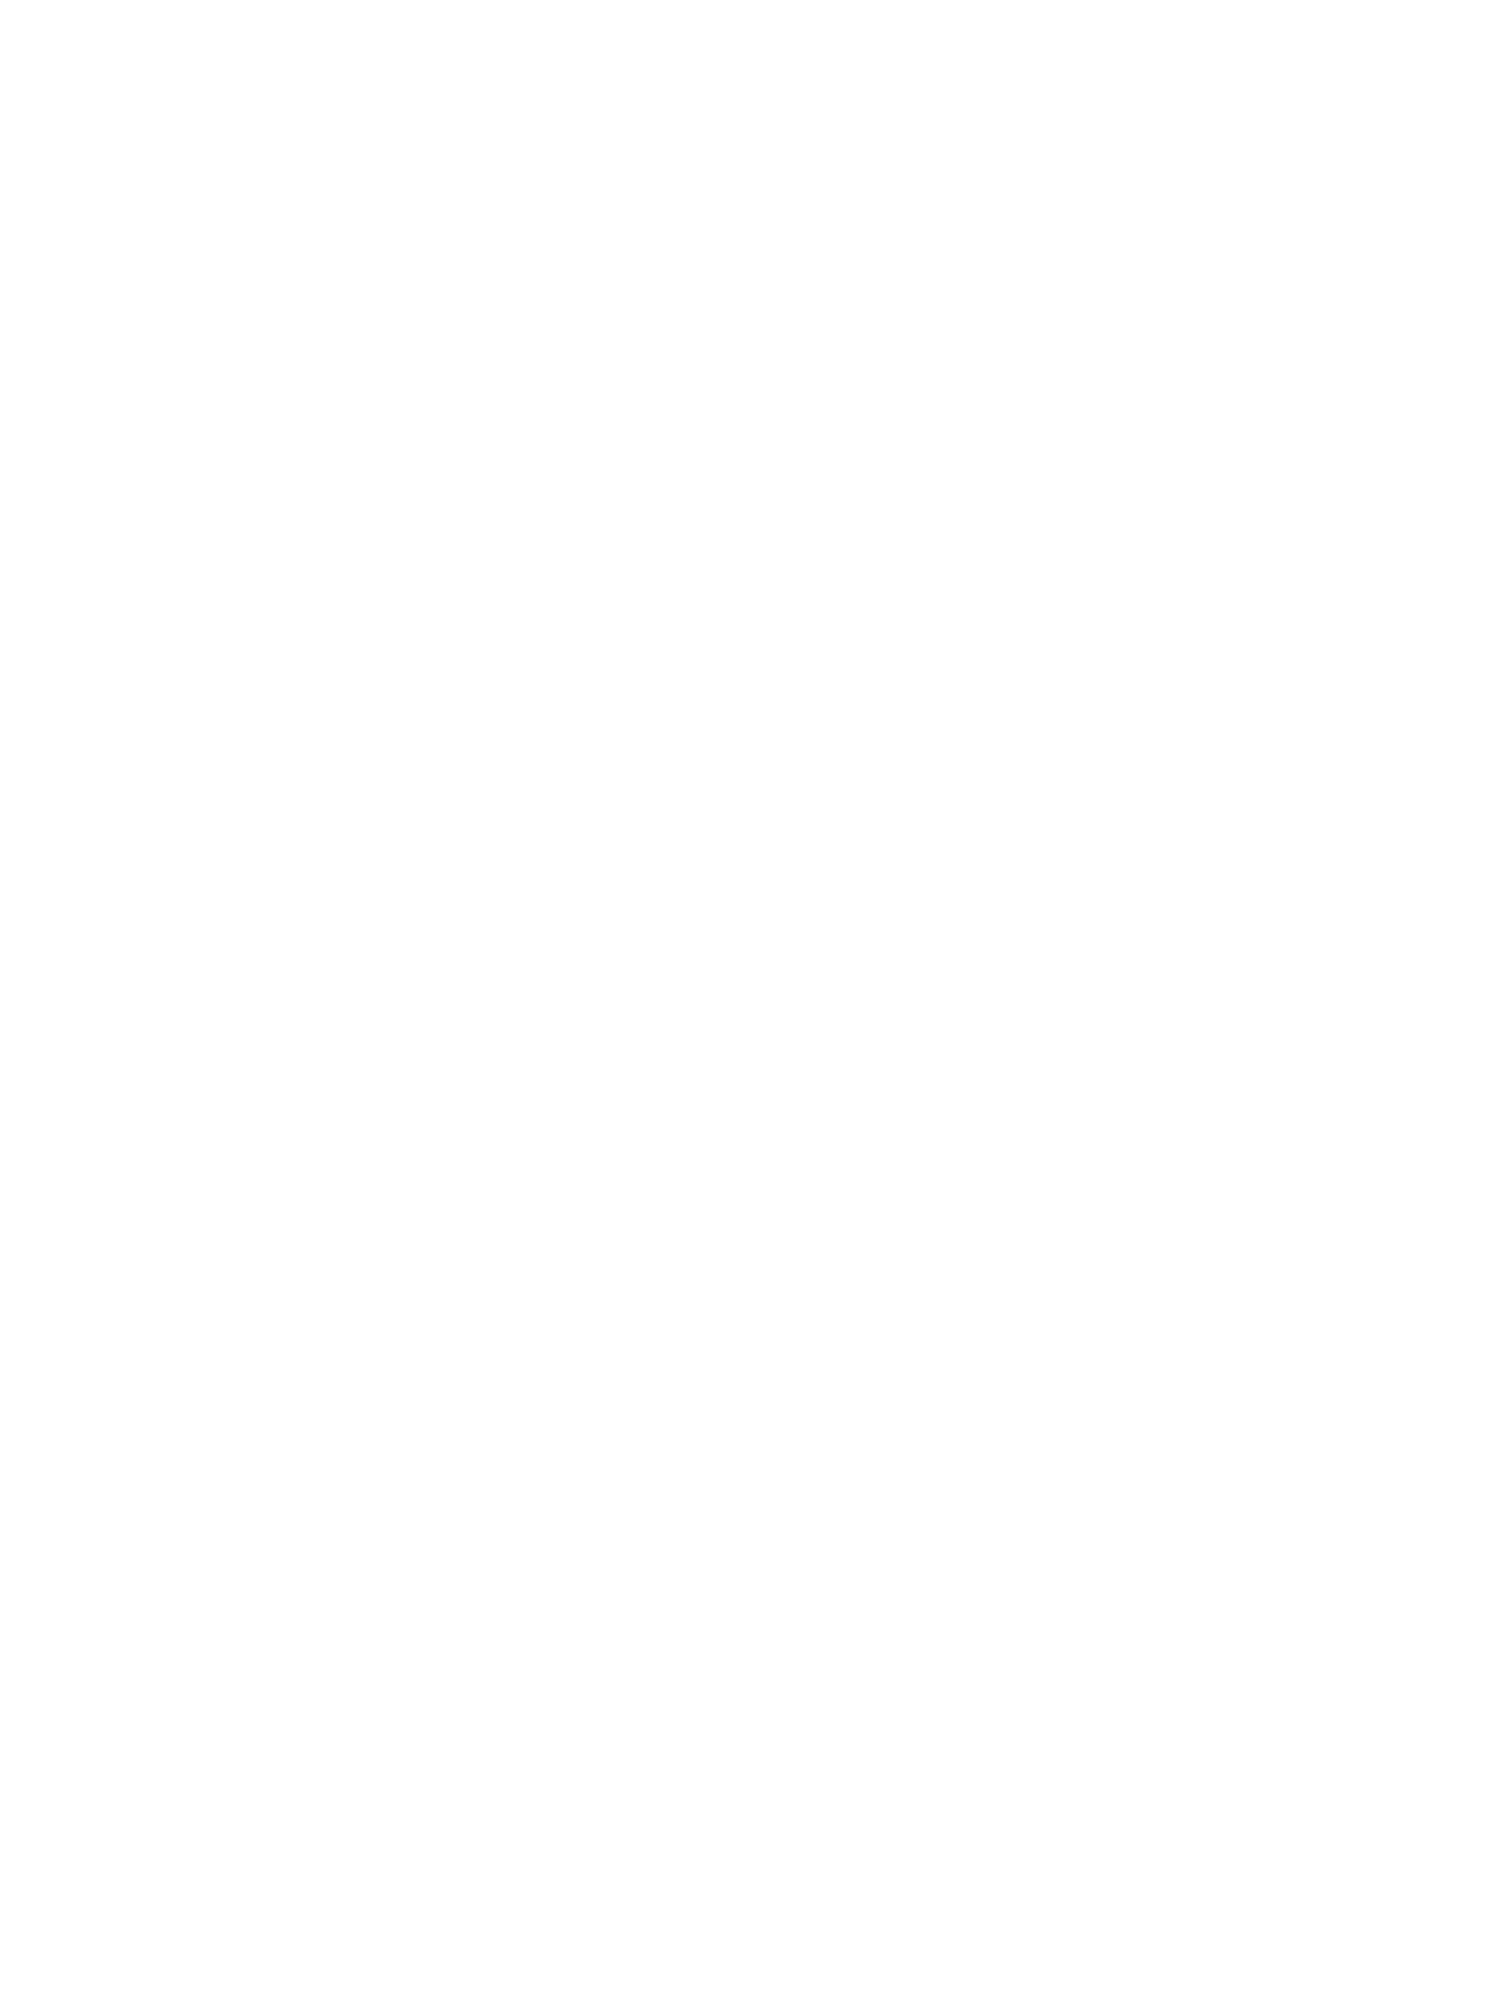 Kaltkreissäge Eisele VMS 300 -19-03-034